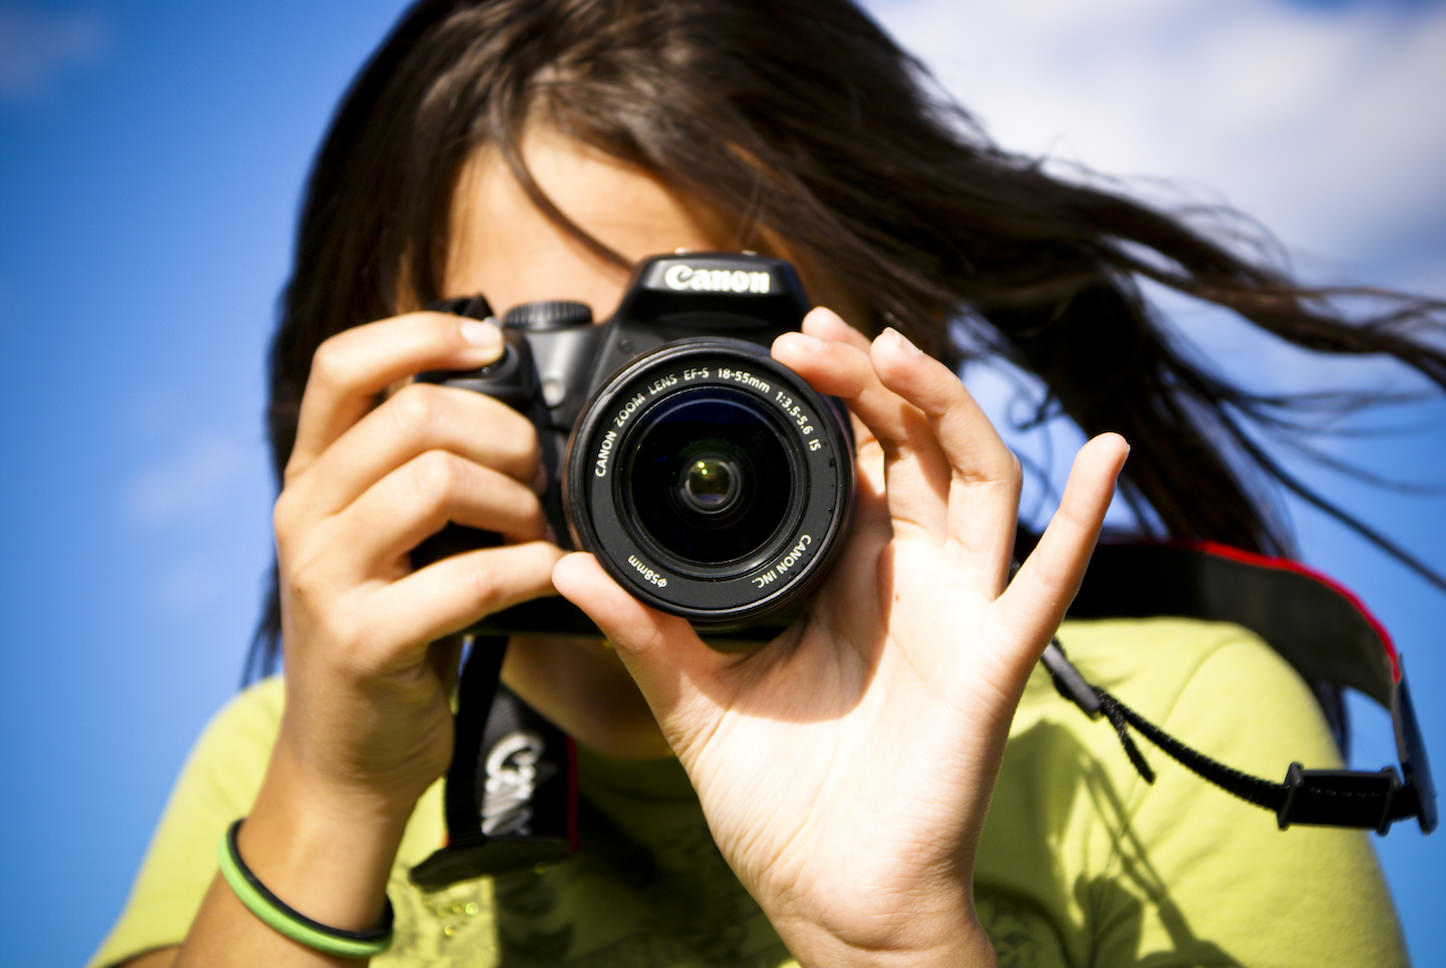 Taking beautiful photos